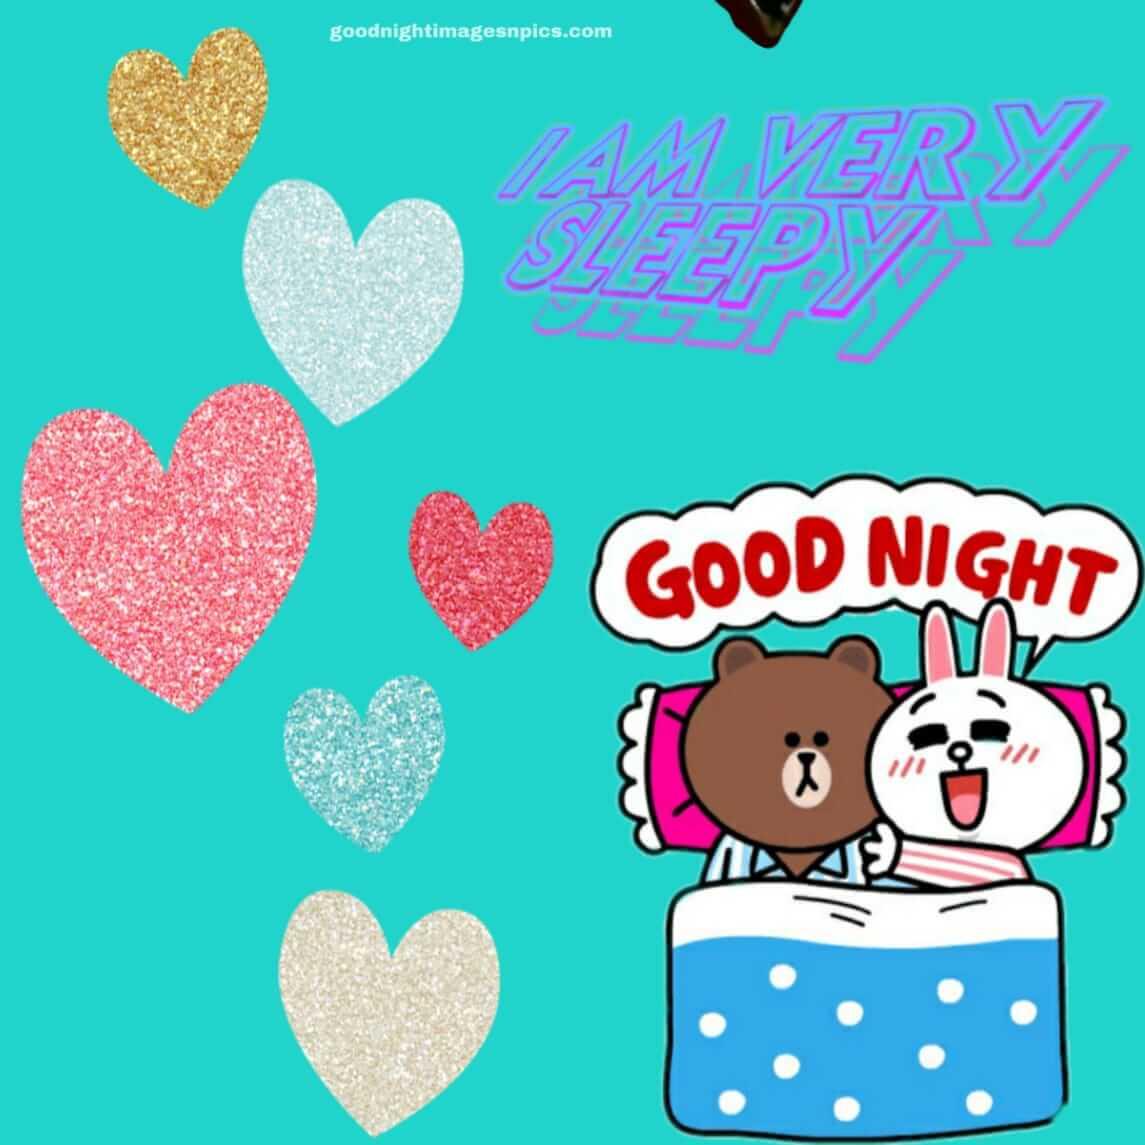 good night images love kiss